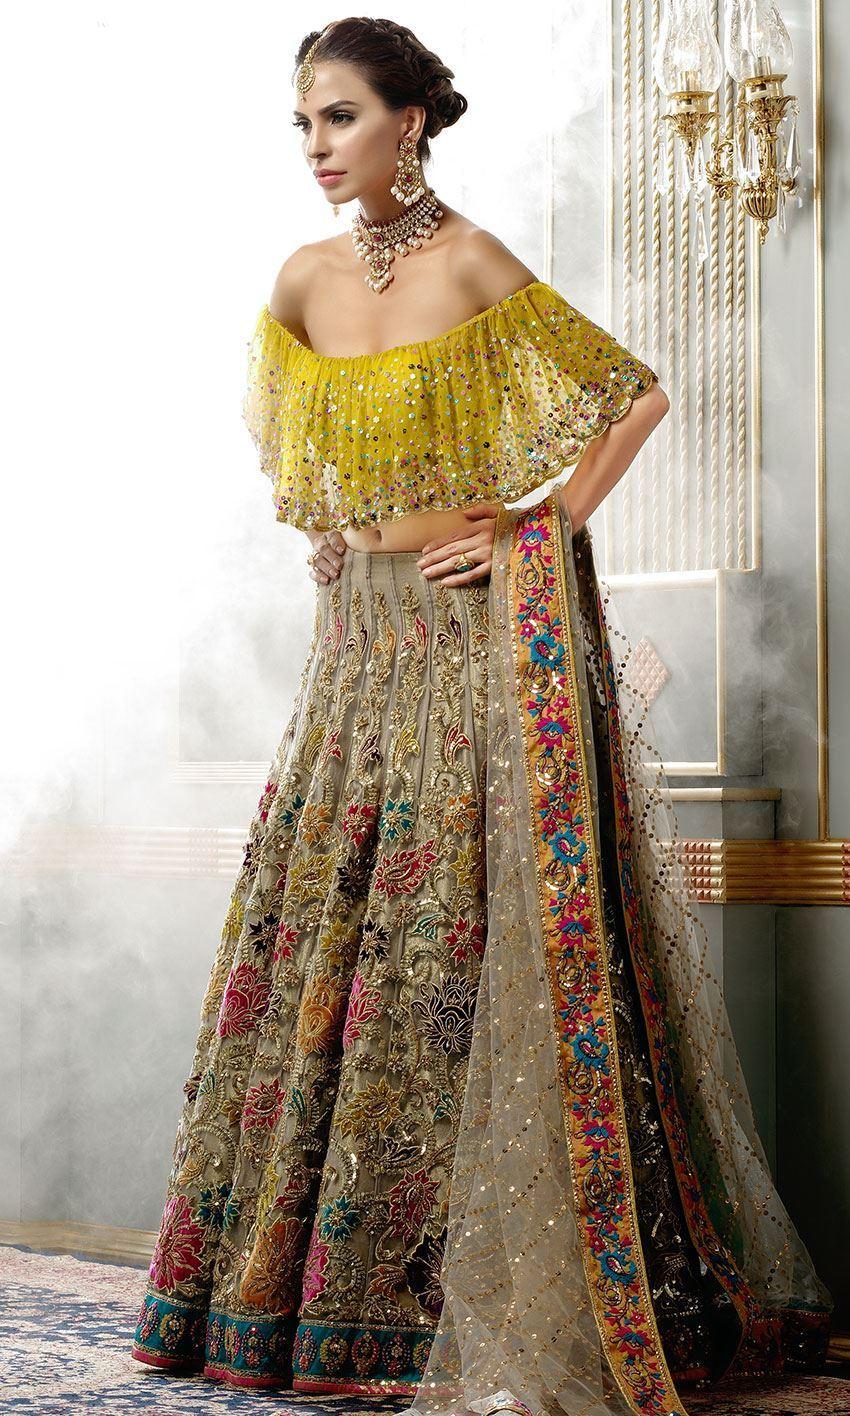 Nomi Ansari Bridal dress Orange color choli heavy embroidered work lehnga